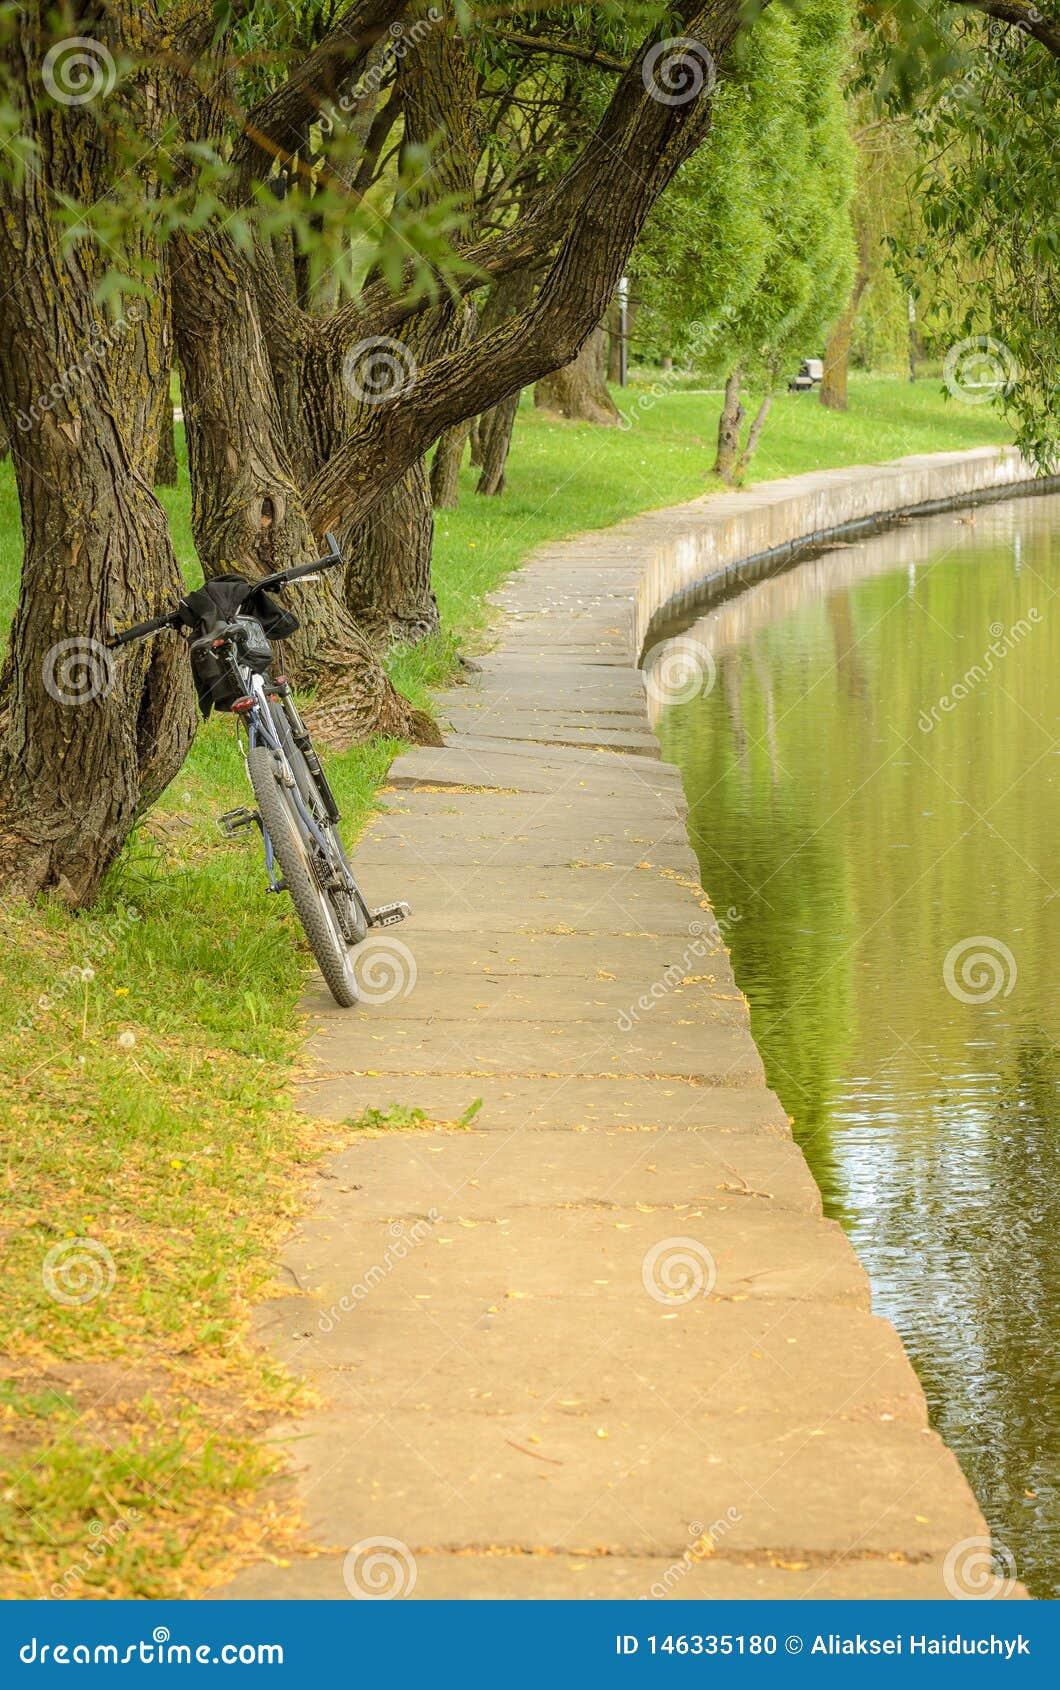 Cykeln n?ra floden in parkerar/cykeln parkerar in n?ra en beh?llare